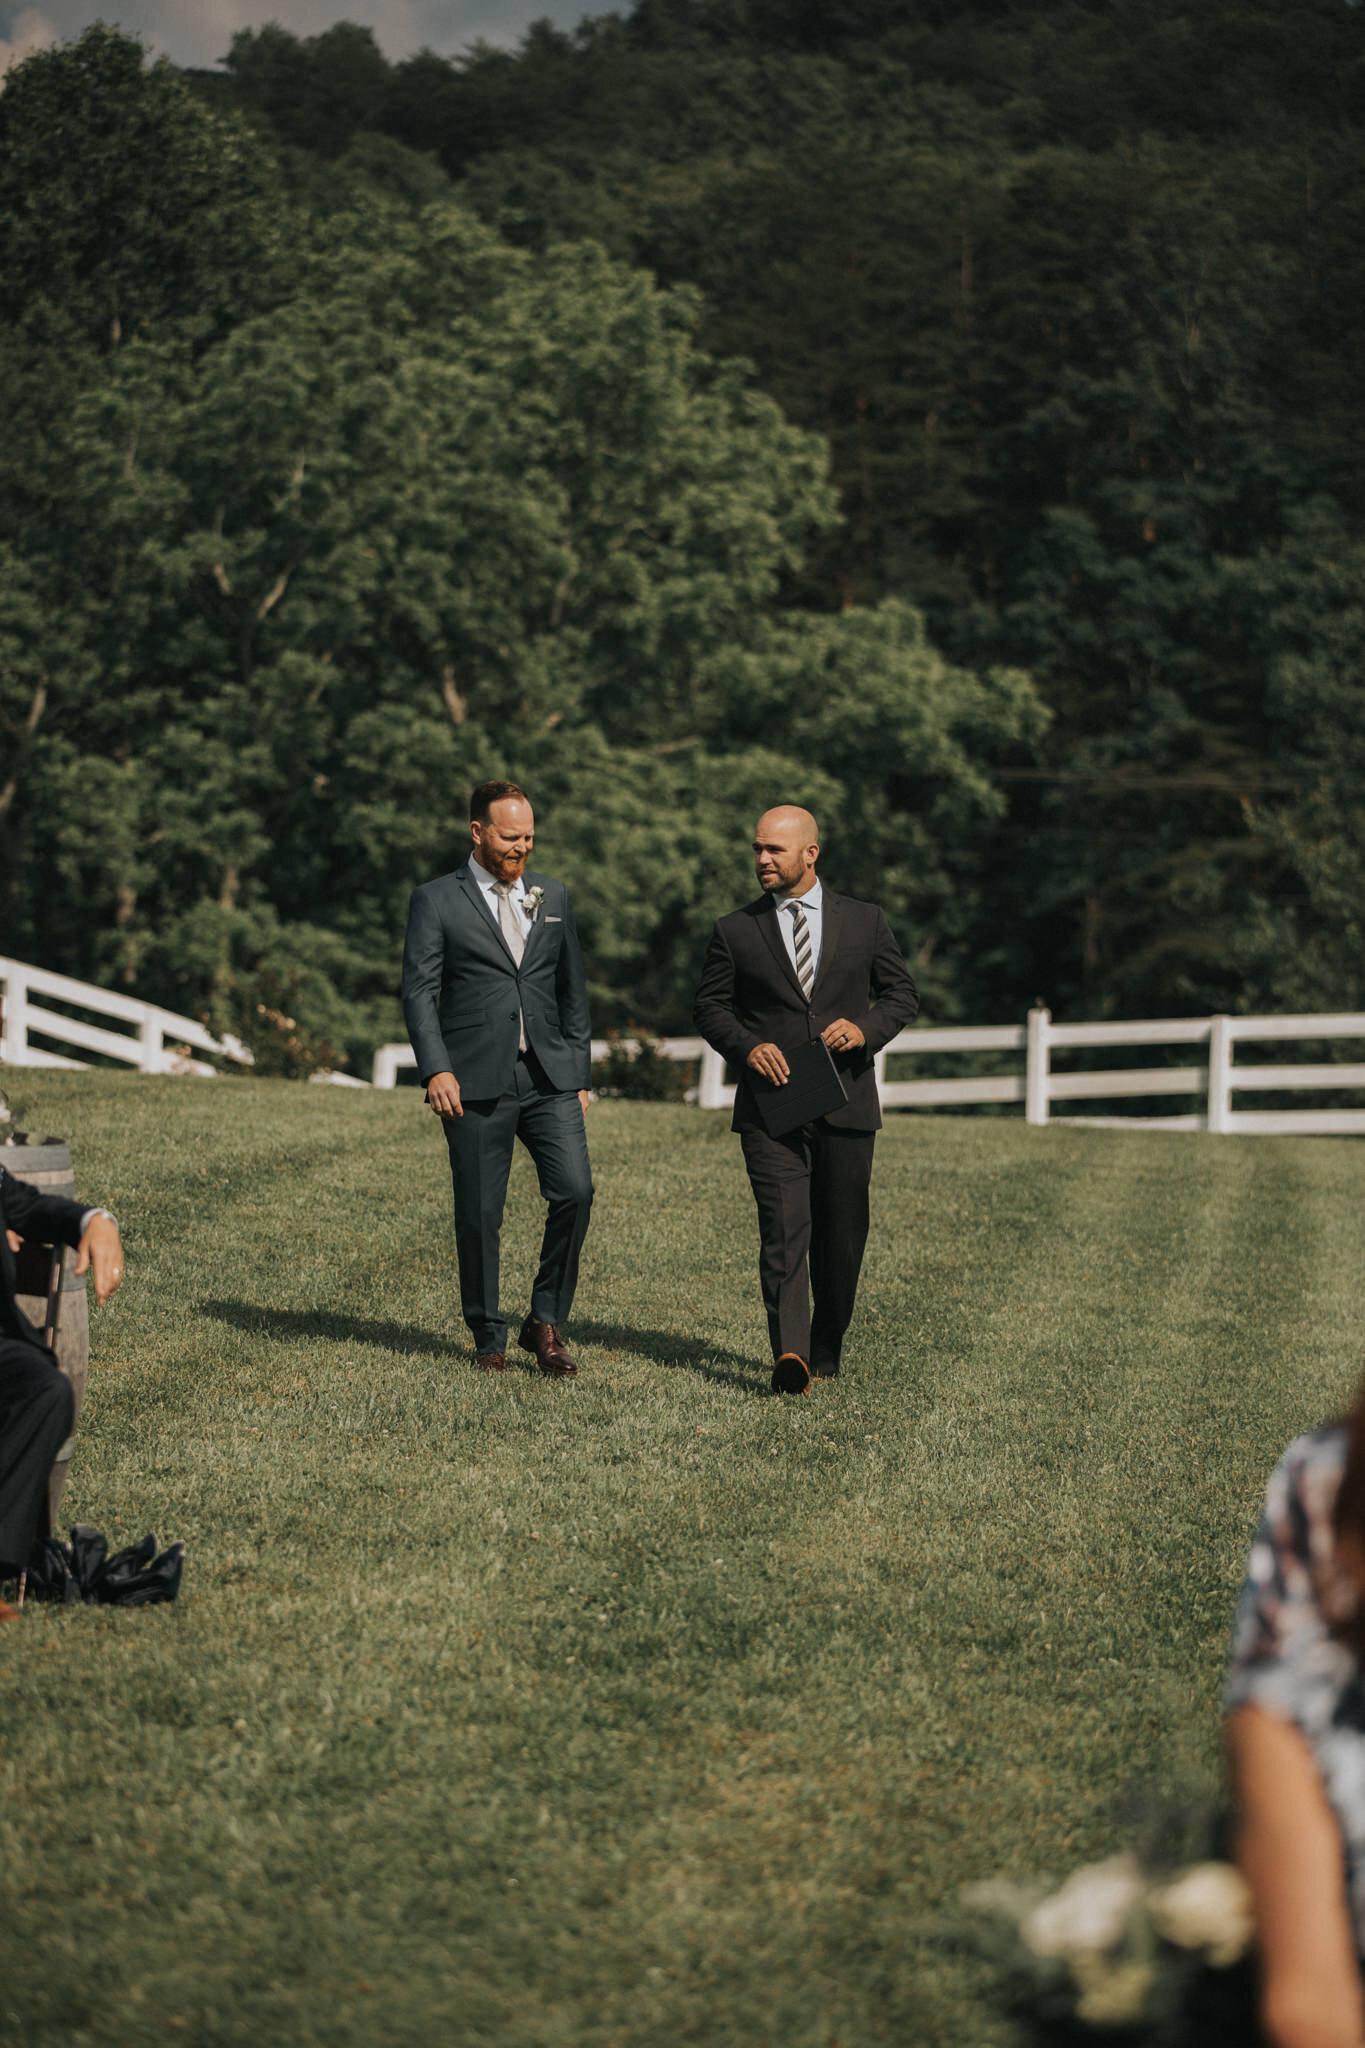 KateMatt-North-Georgia-Wedding-Photographer-Mountain-Laurel-Farm-92.jpg